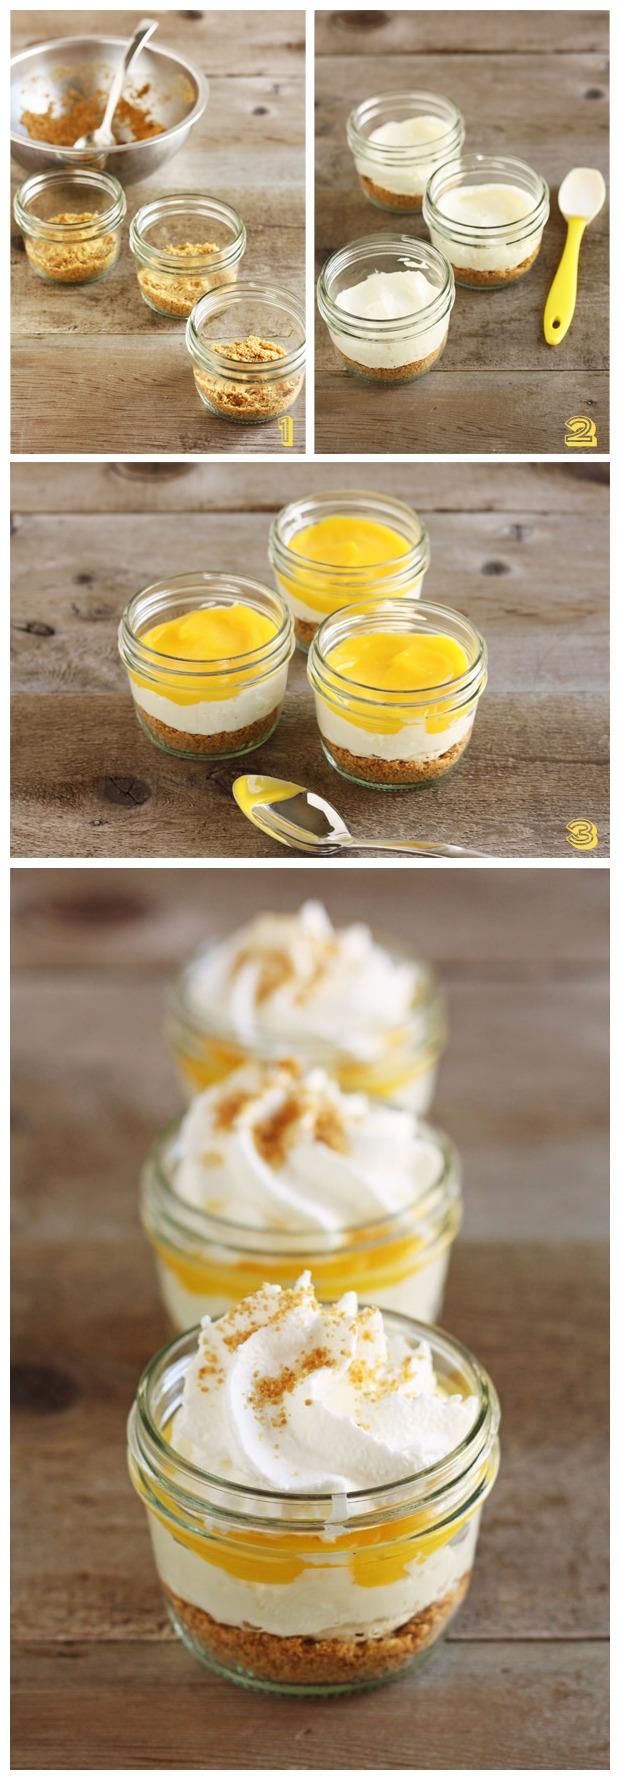 No-Bake Lemon Cheese Cake Recipe